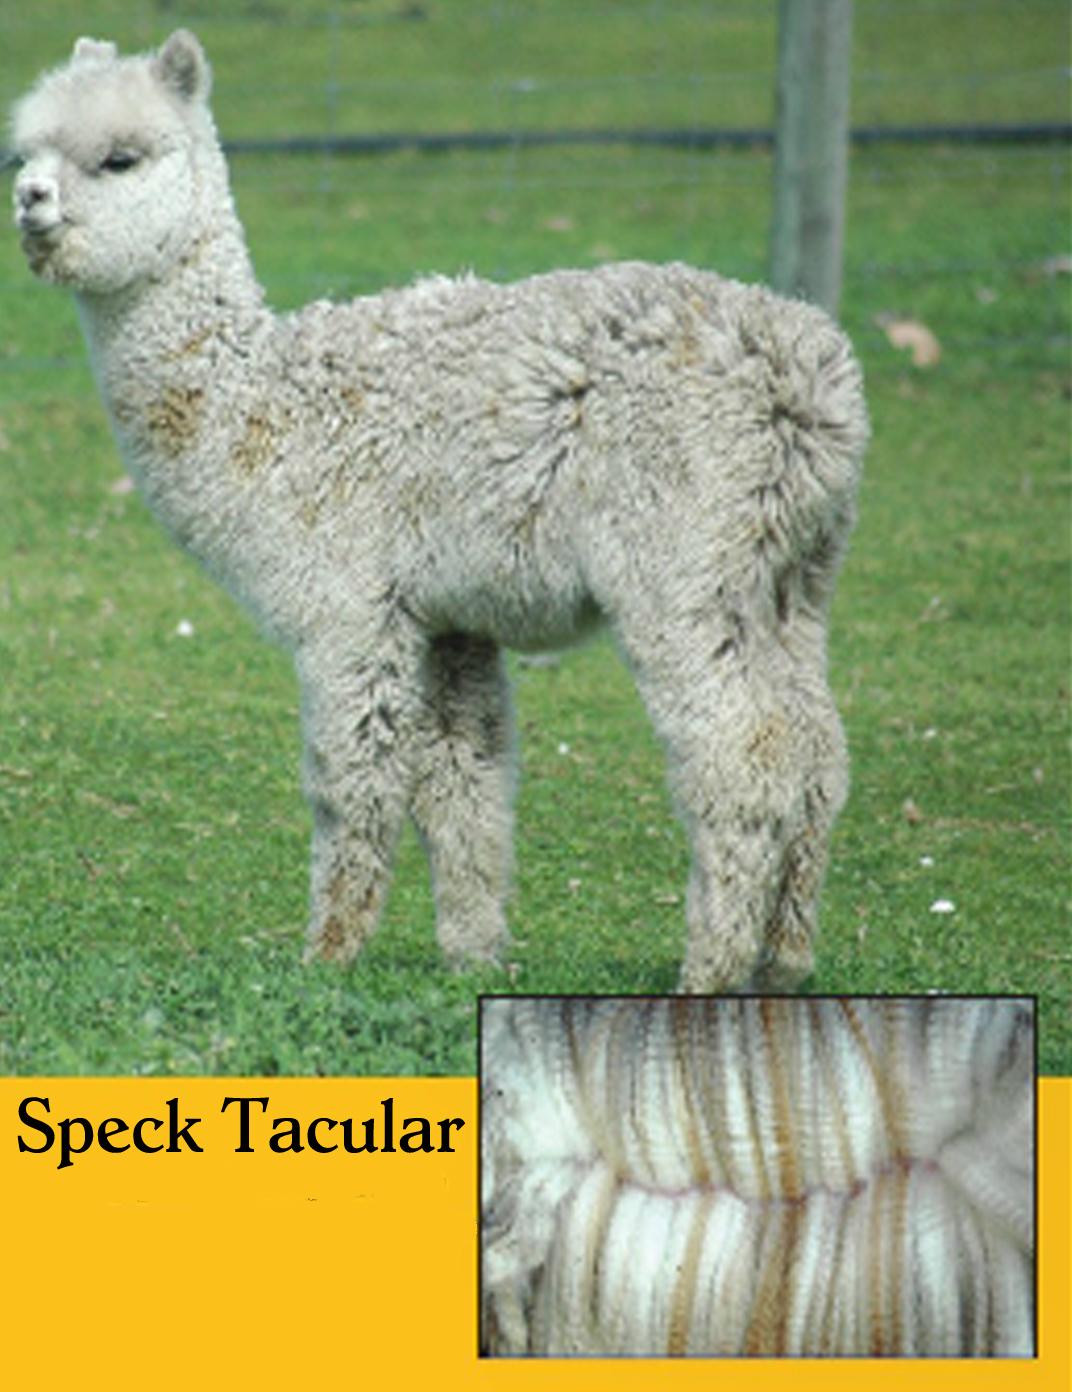 Speck Tacular 2